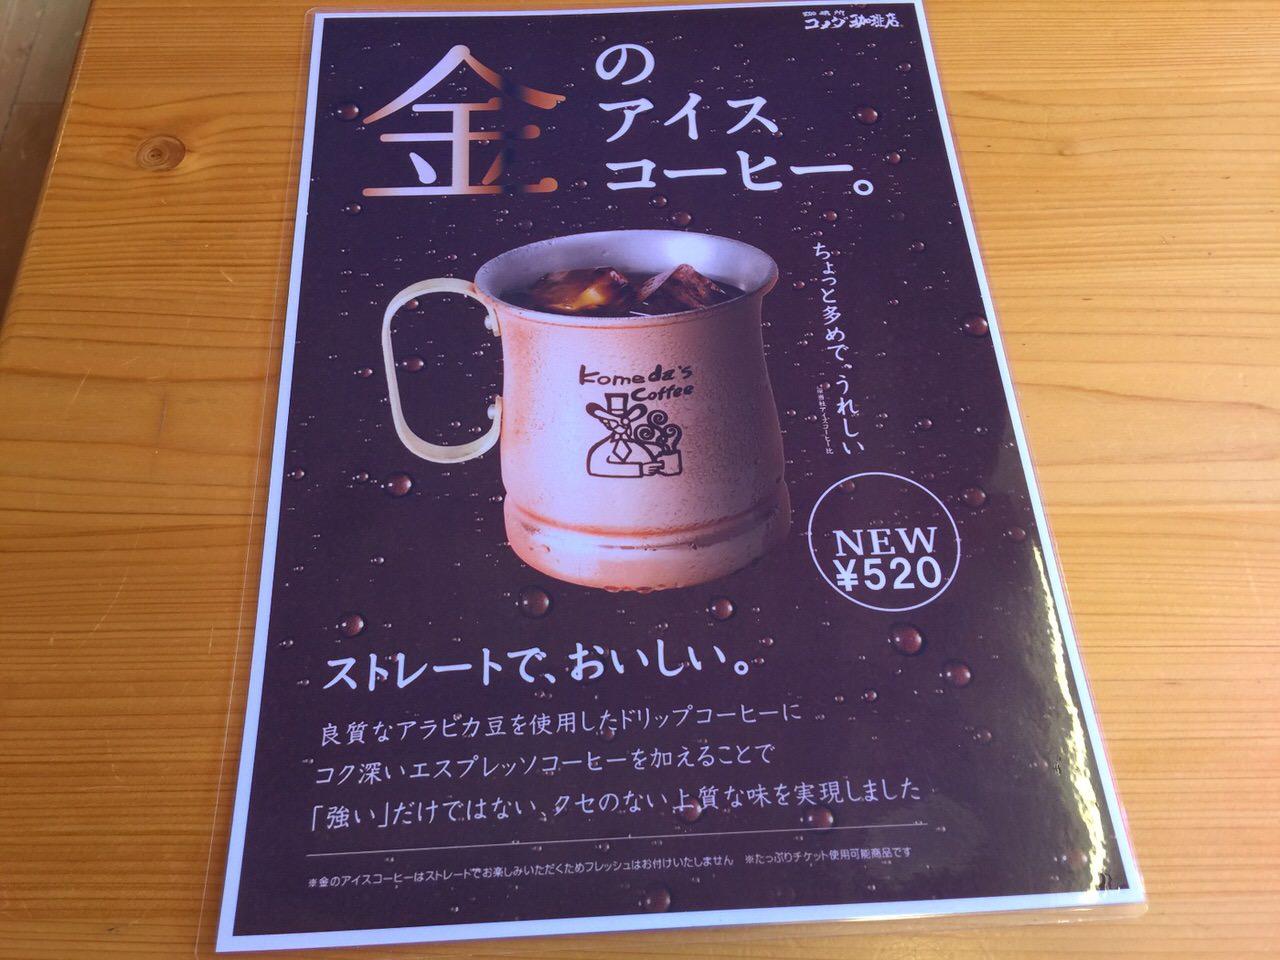 Komeda coffee 3516